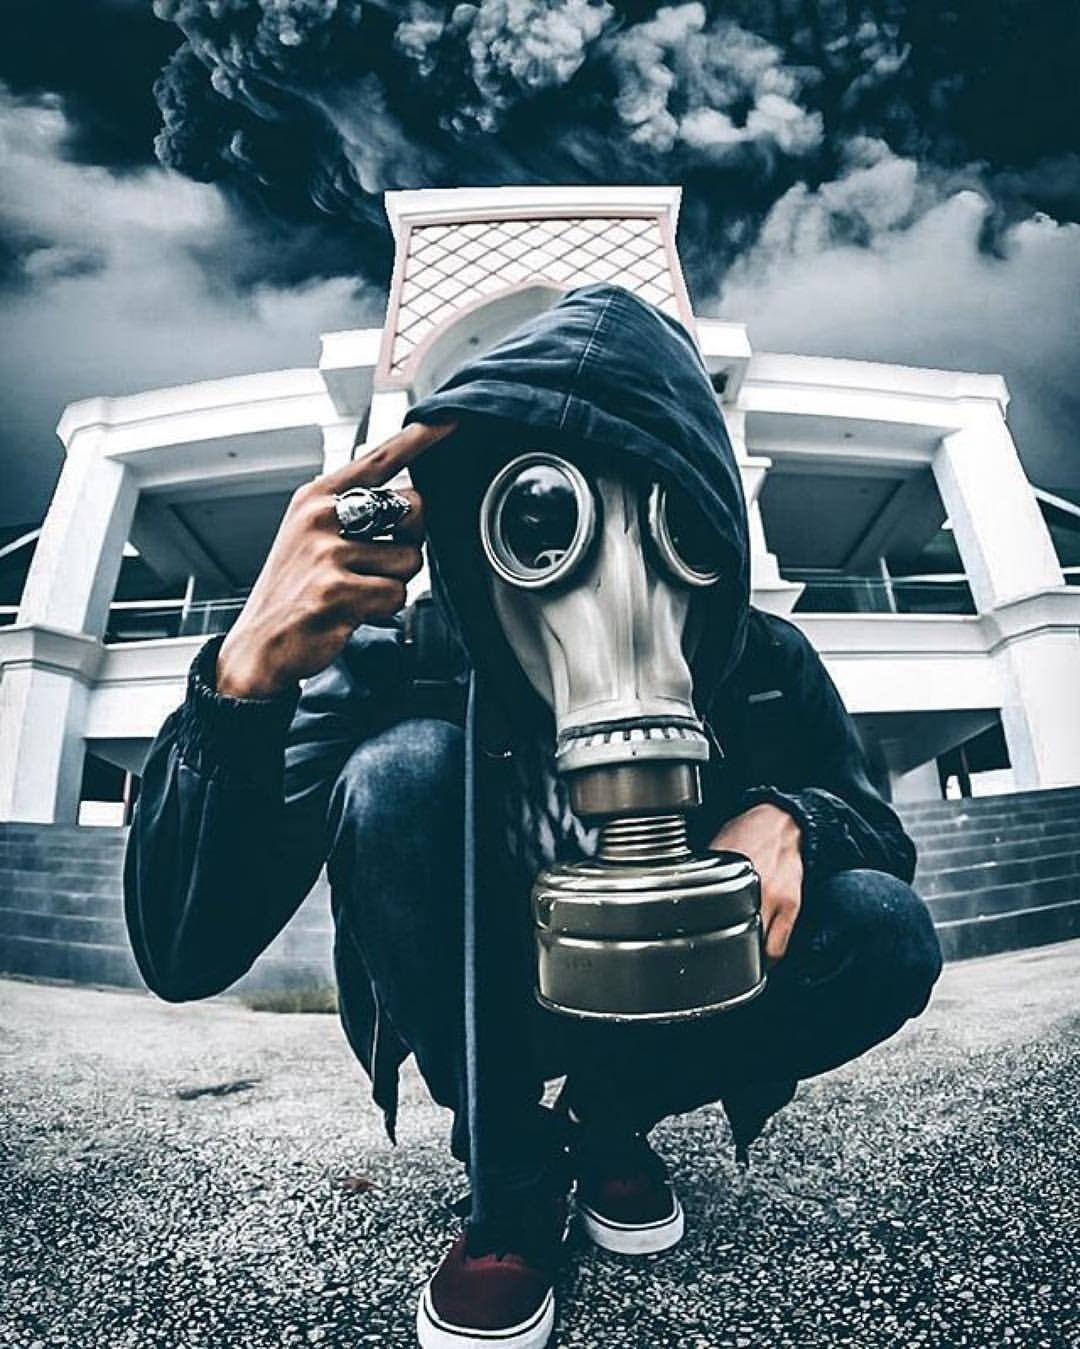 gasmask fotos com máscara em 2018 pinterest graffiti art